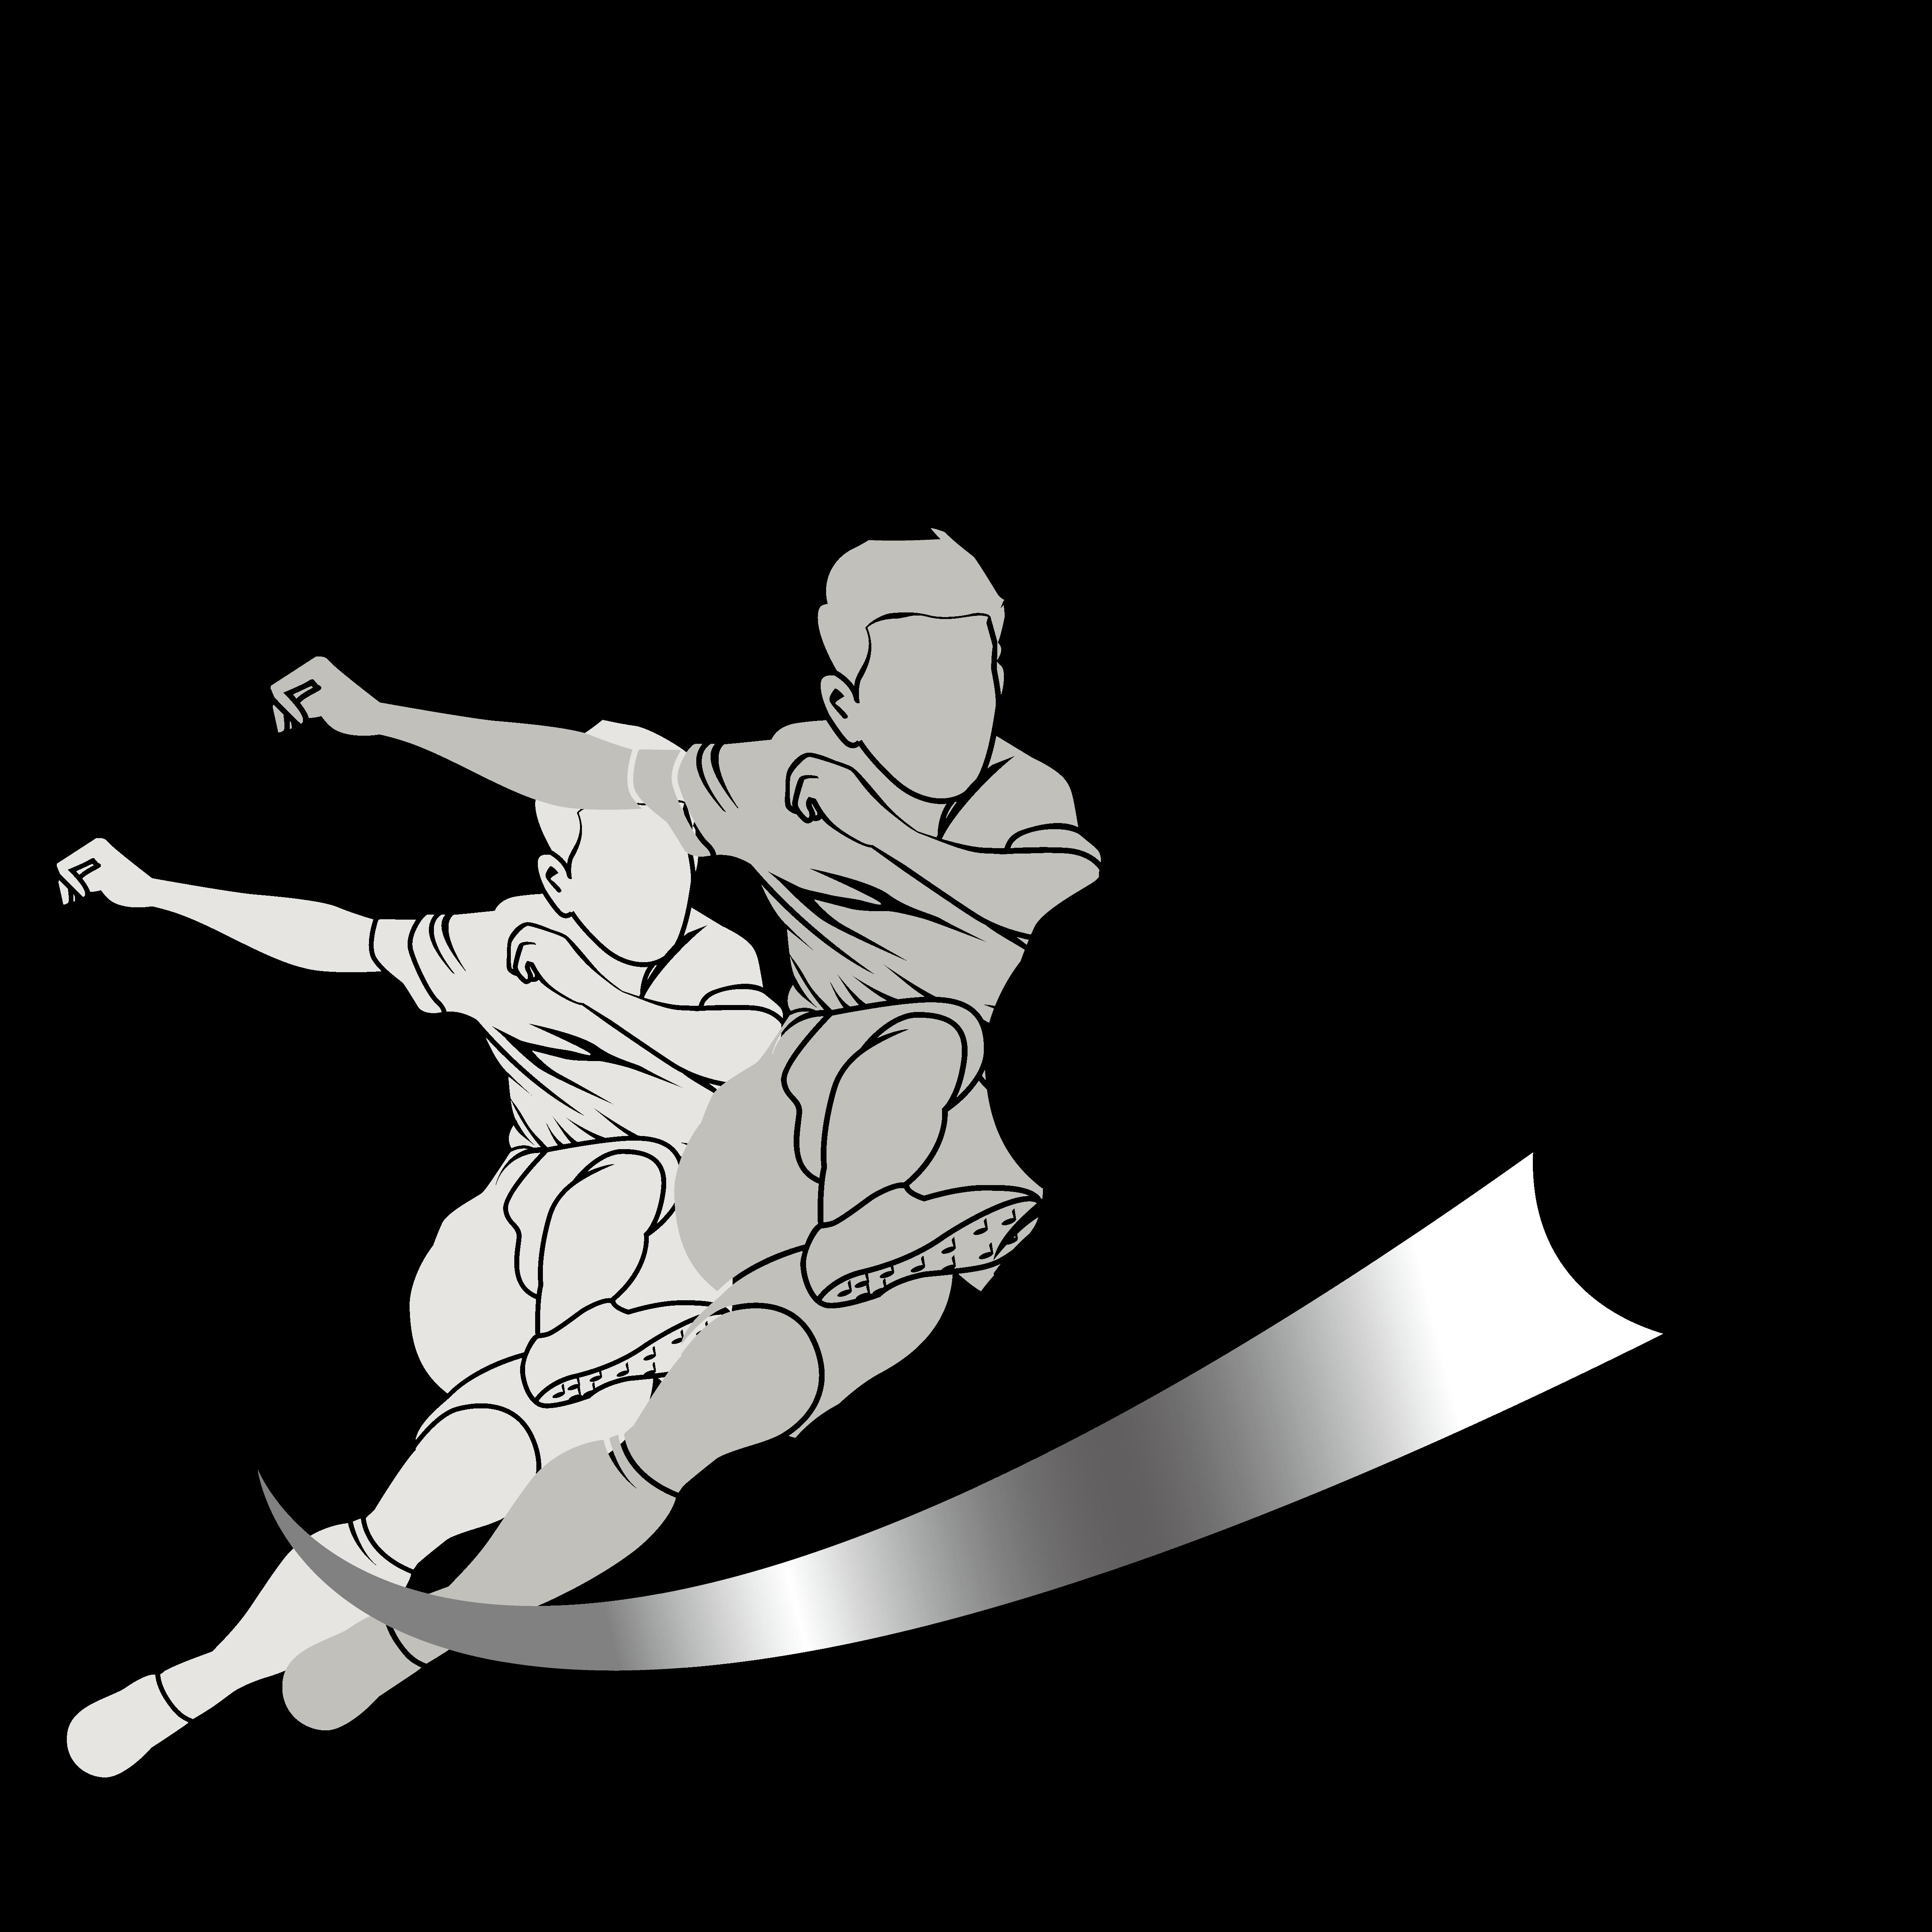 Player Football Sport Kick Free Transparent Image Hd Football Images Football Sports Gallery